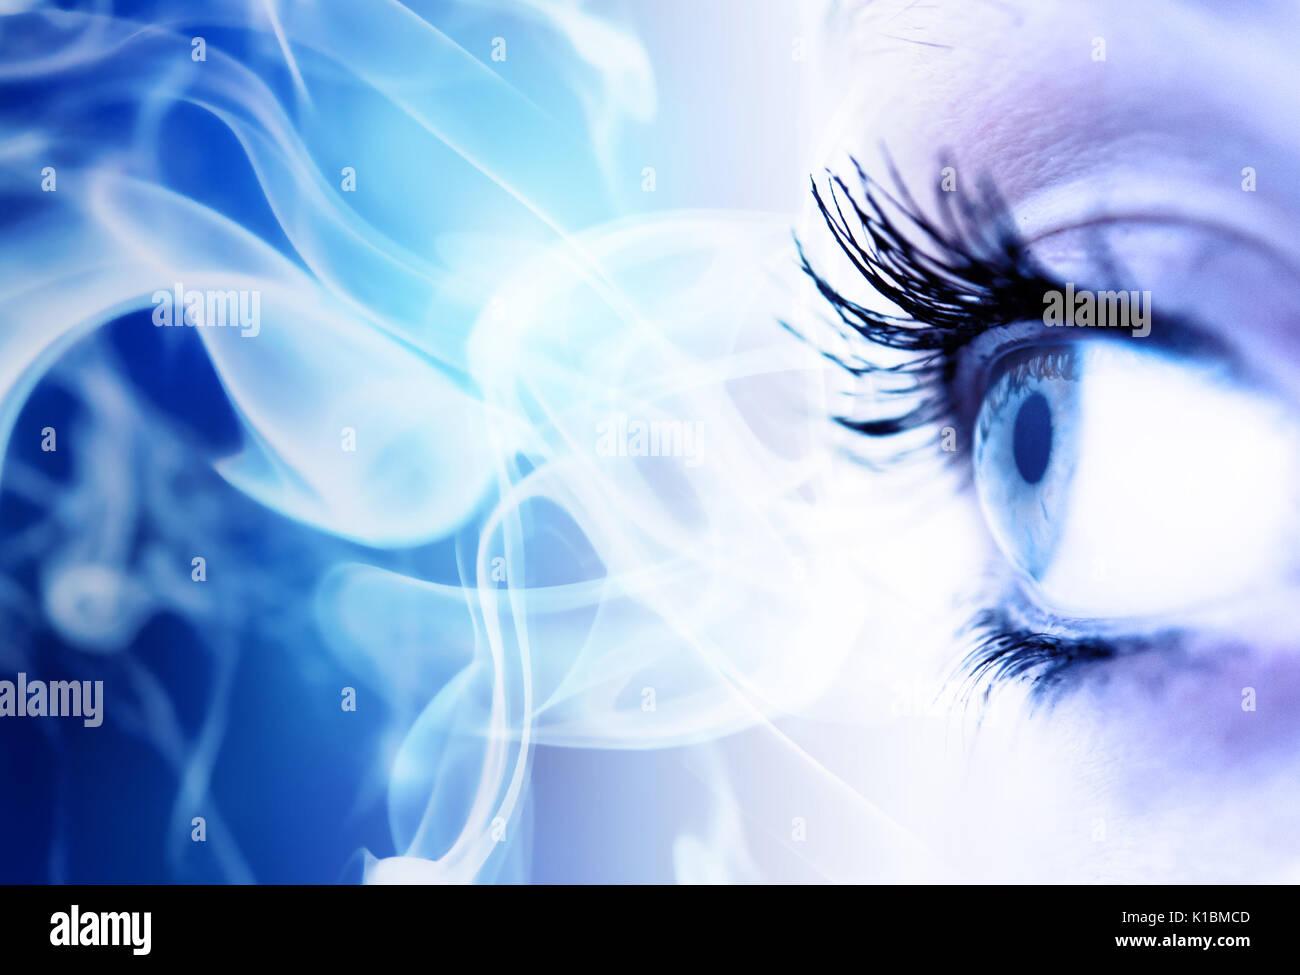 Cerca de un ojo femenino con copia espacio abstracto azul Imagen De Stock